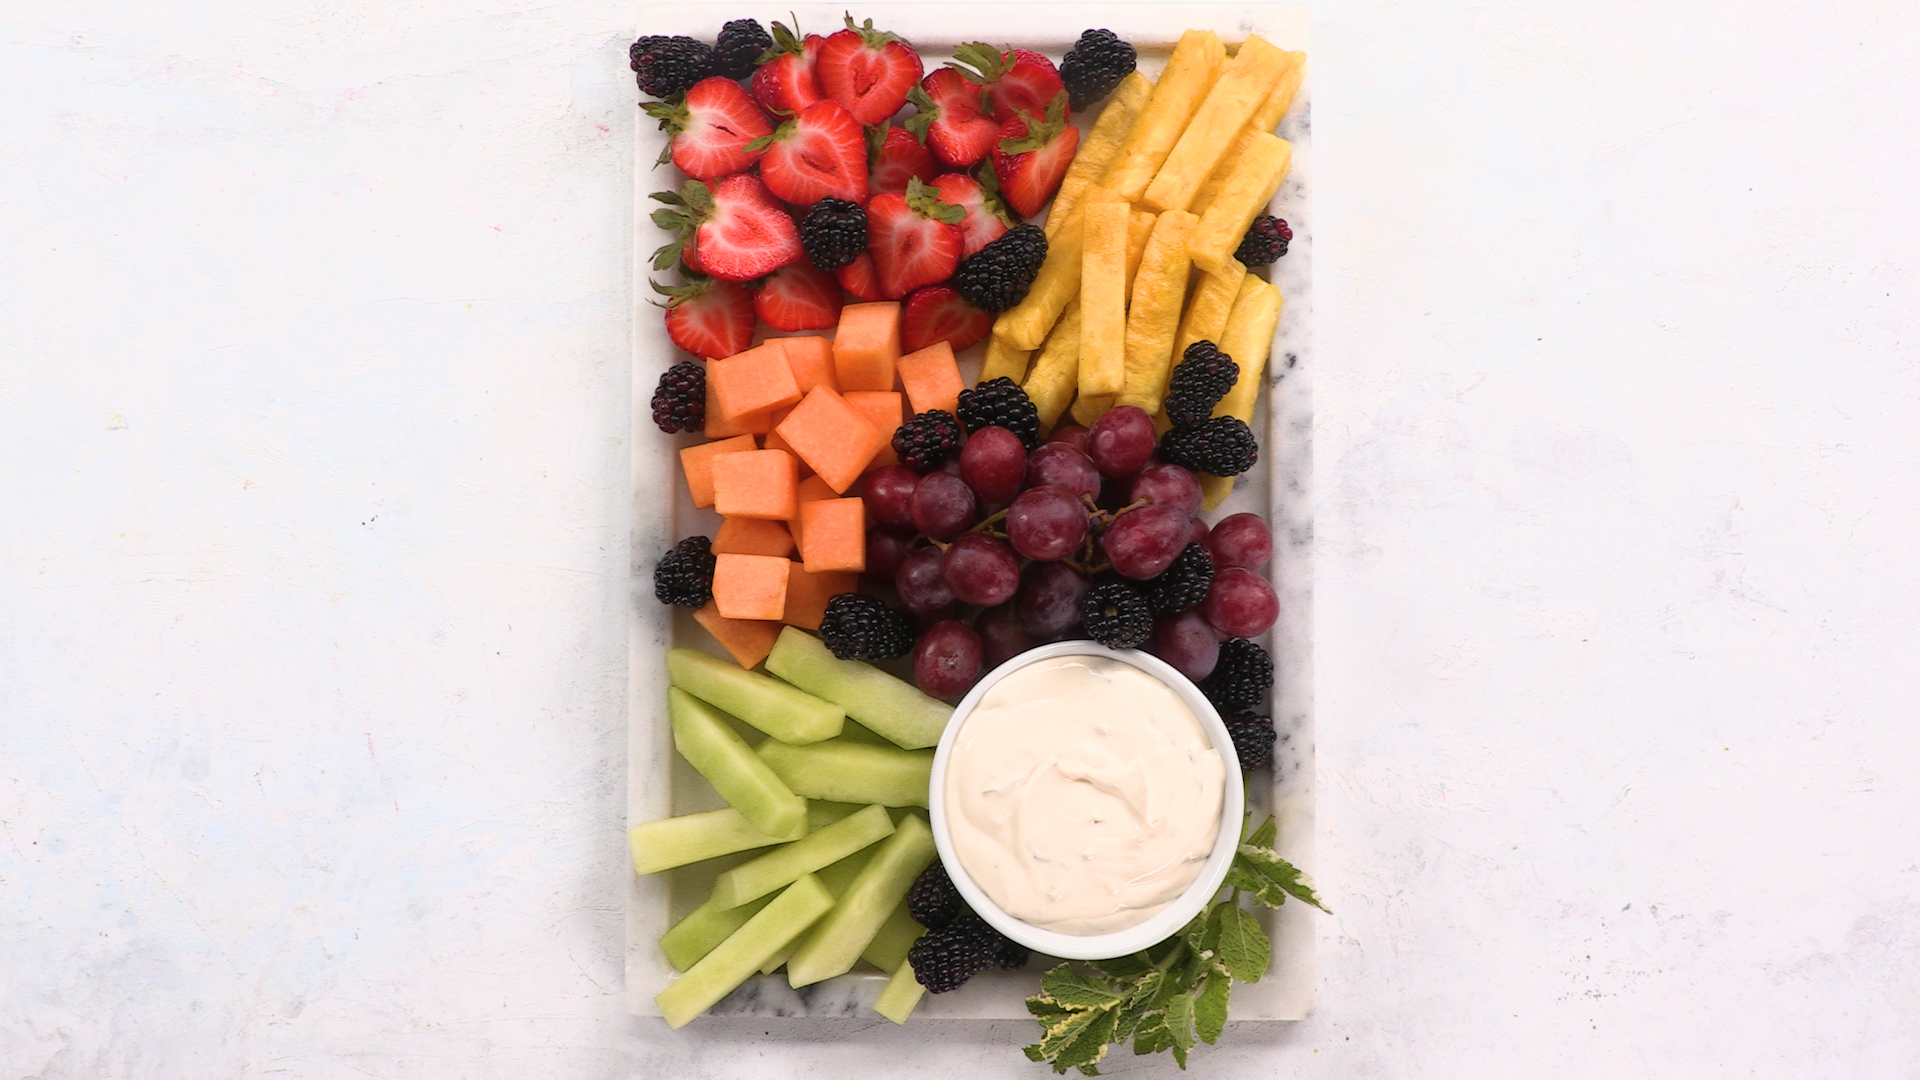 Frudité Platter with Mint-Lime Dip image